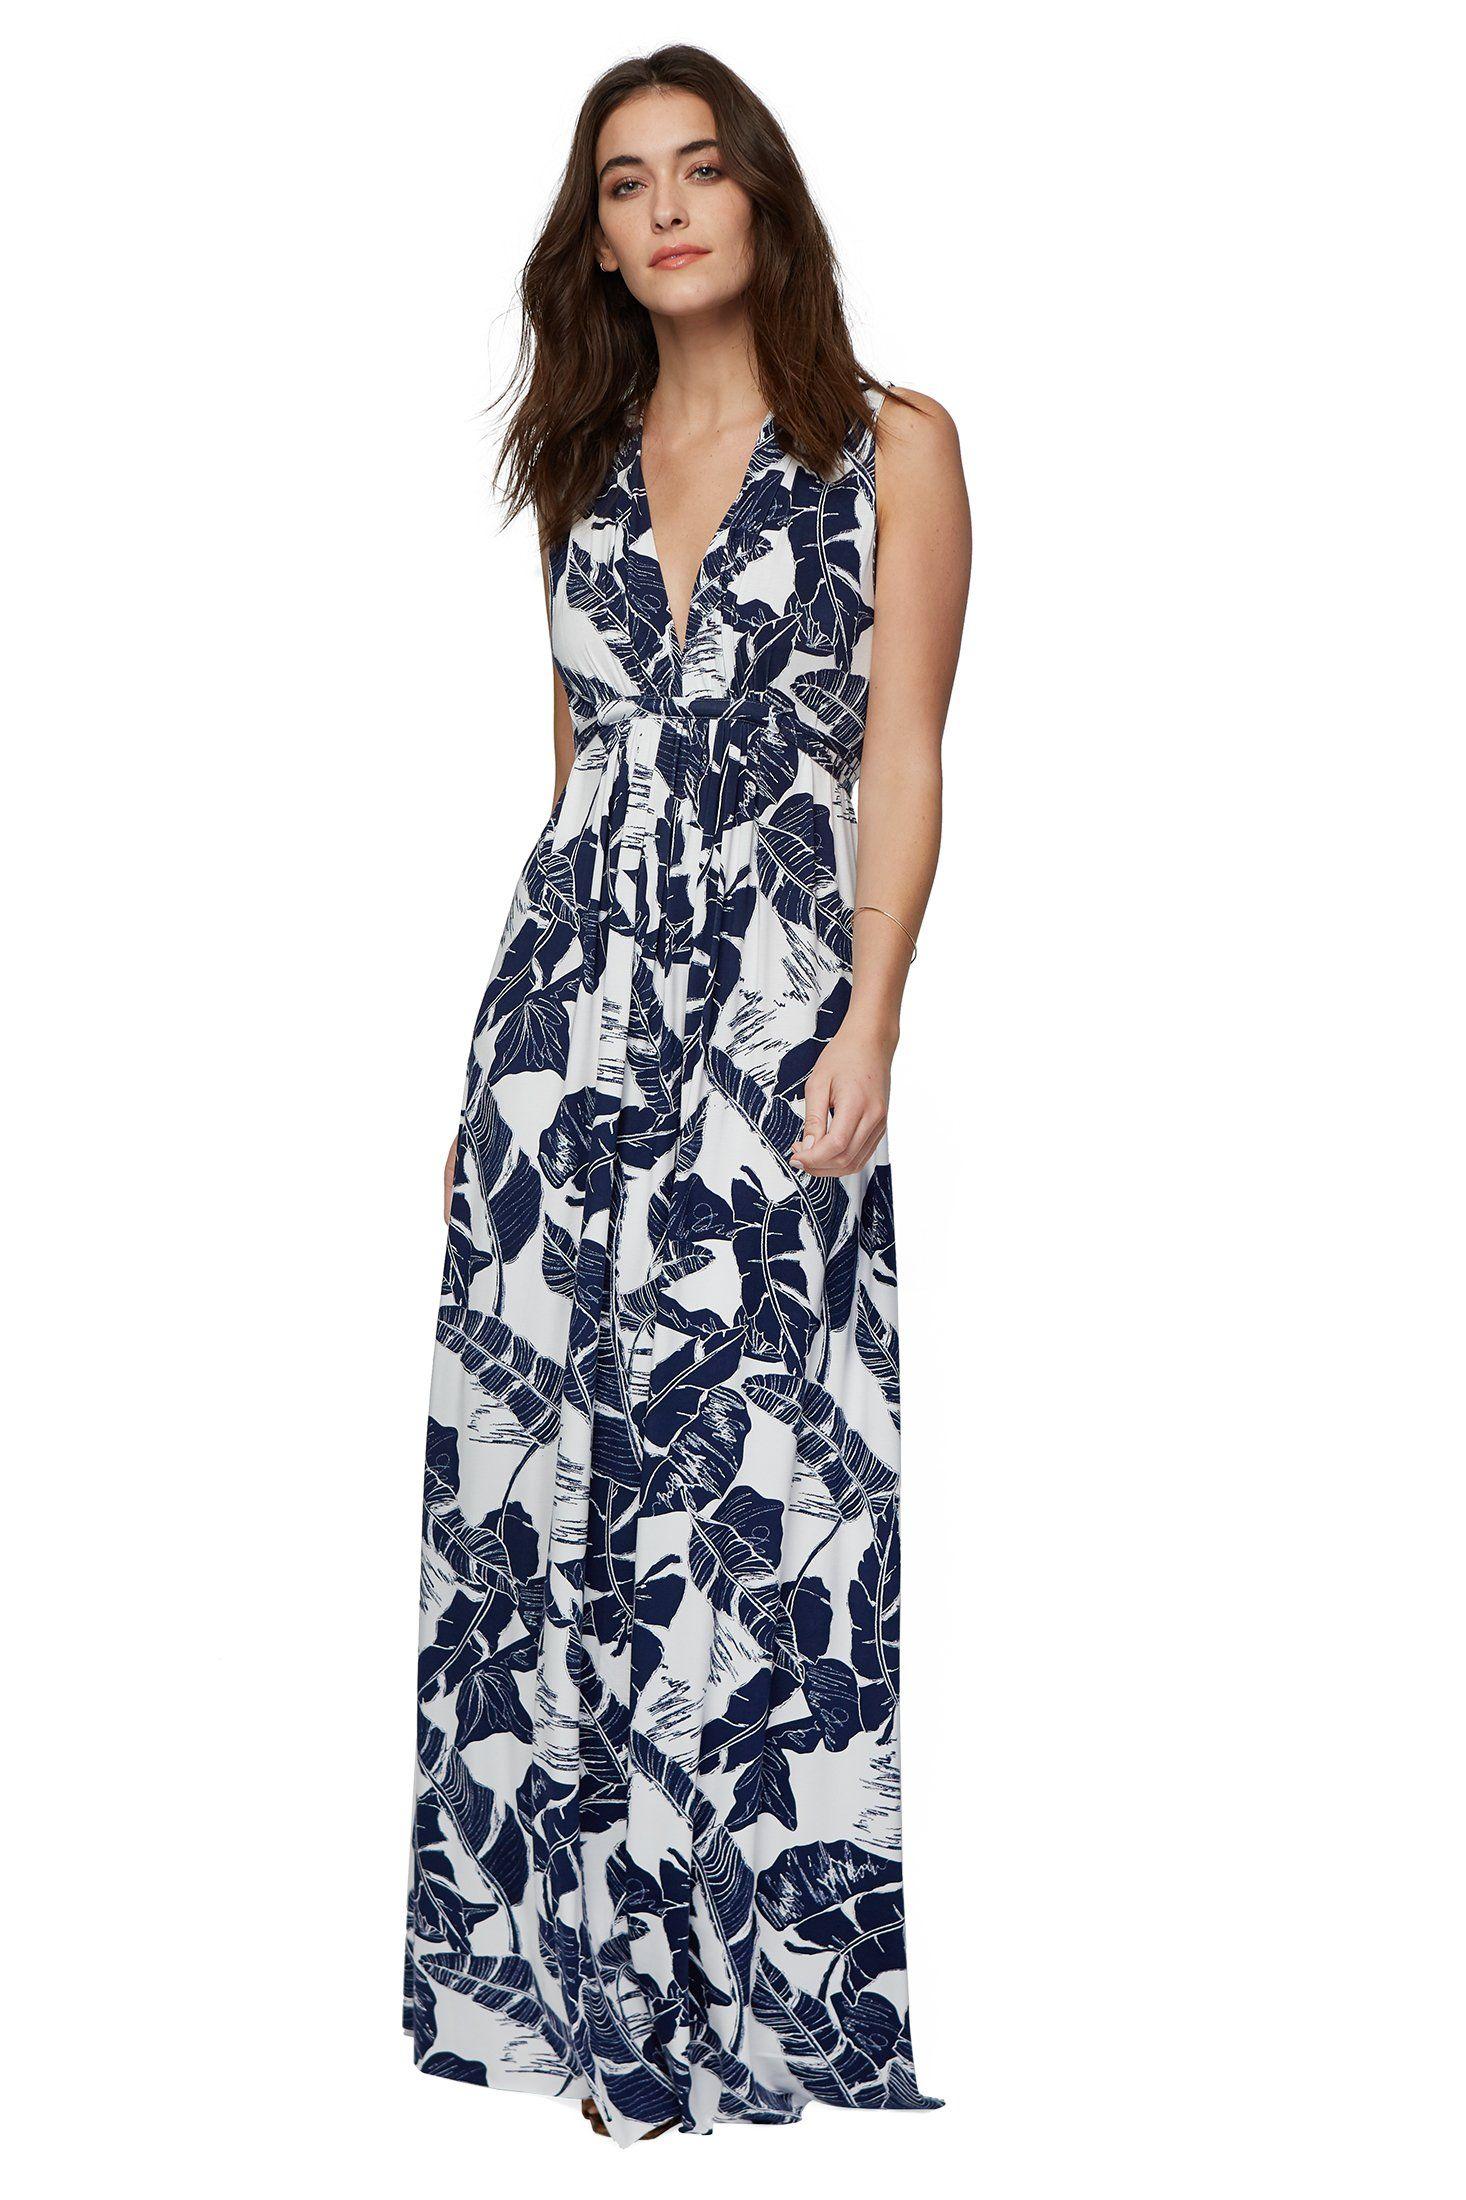 56e5f7c2c2ea1 Harlow Palm Leaf Print Maxi Dress from Rachel Pally #palmleaf #maxidress